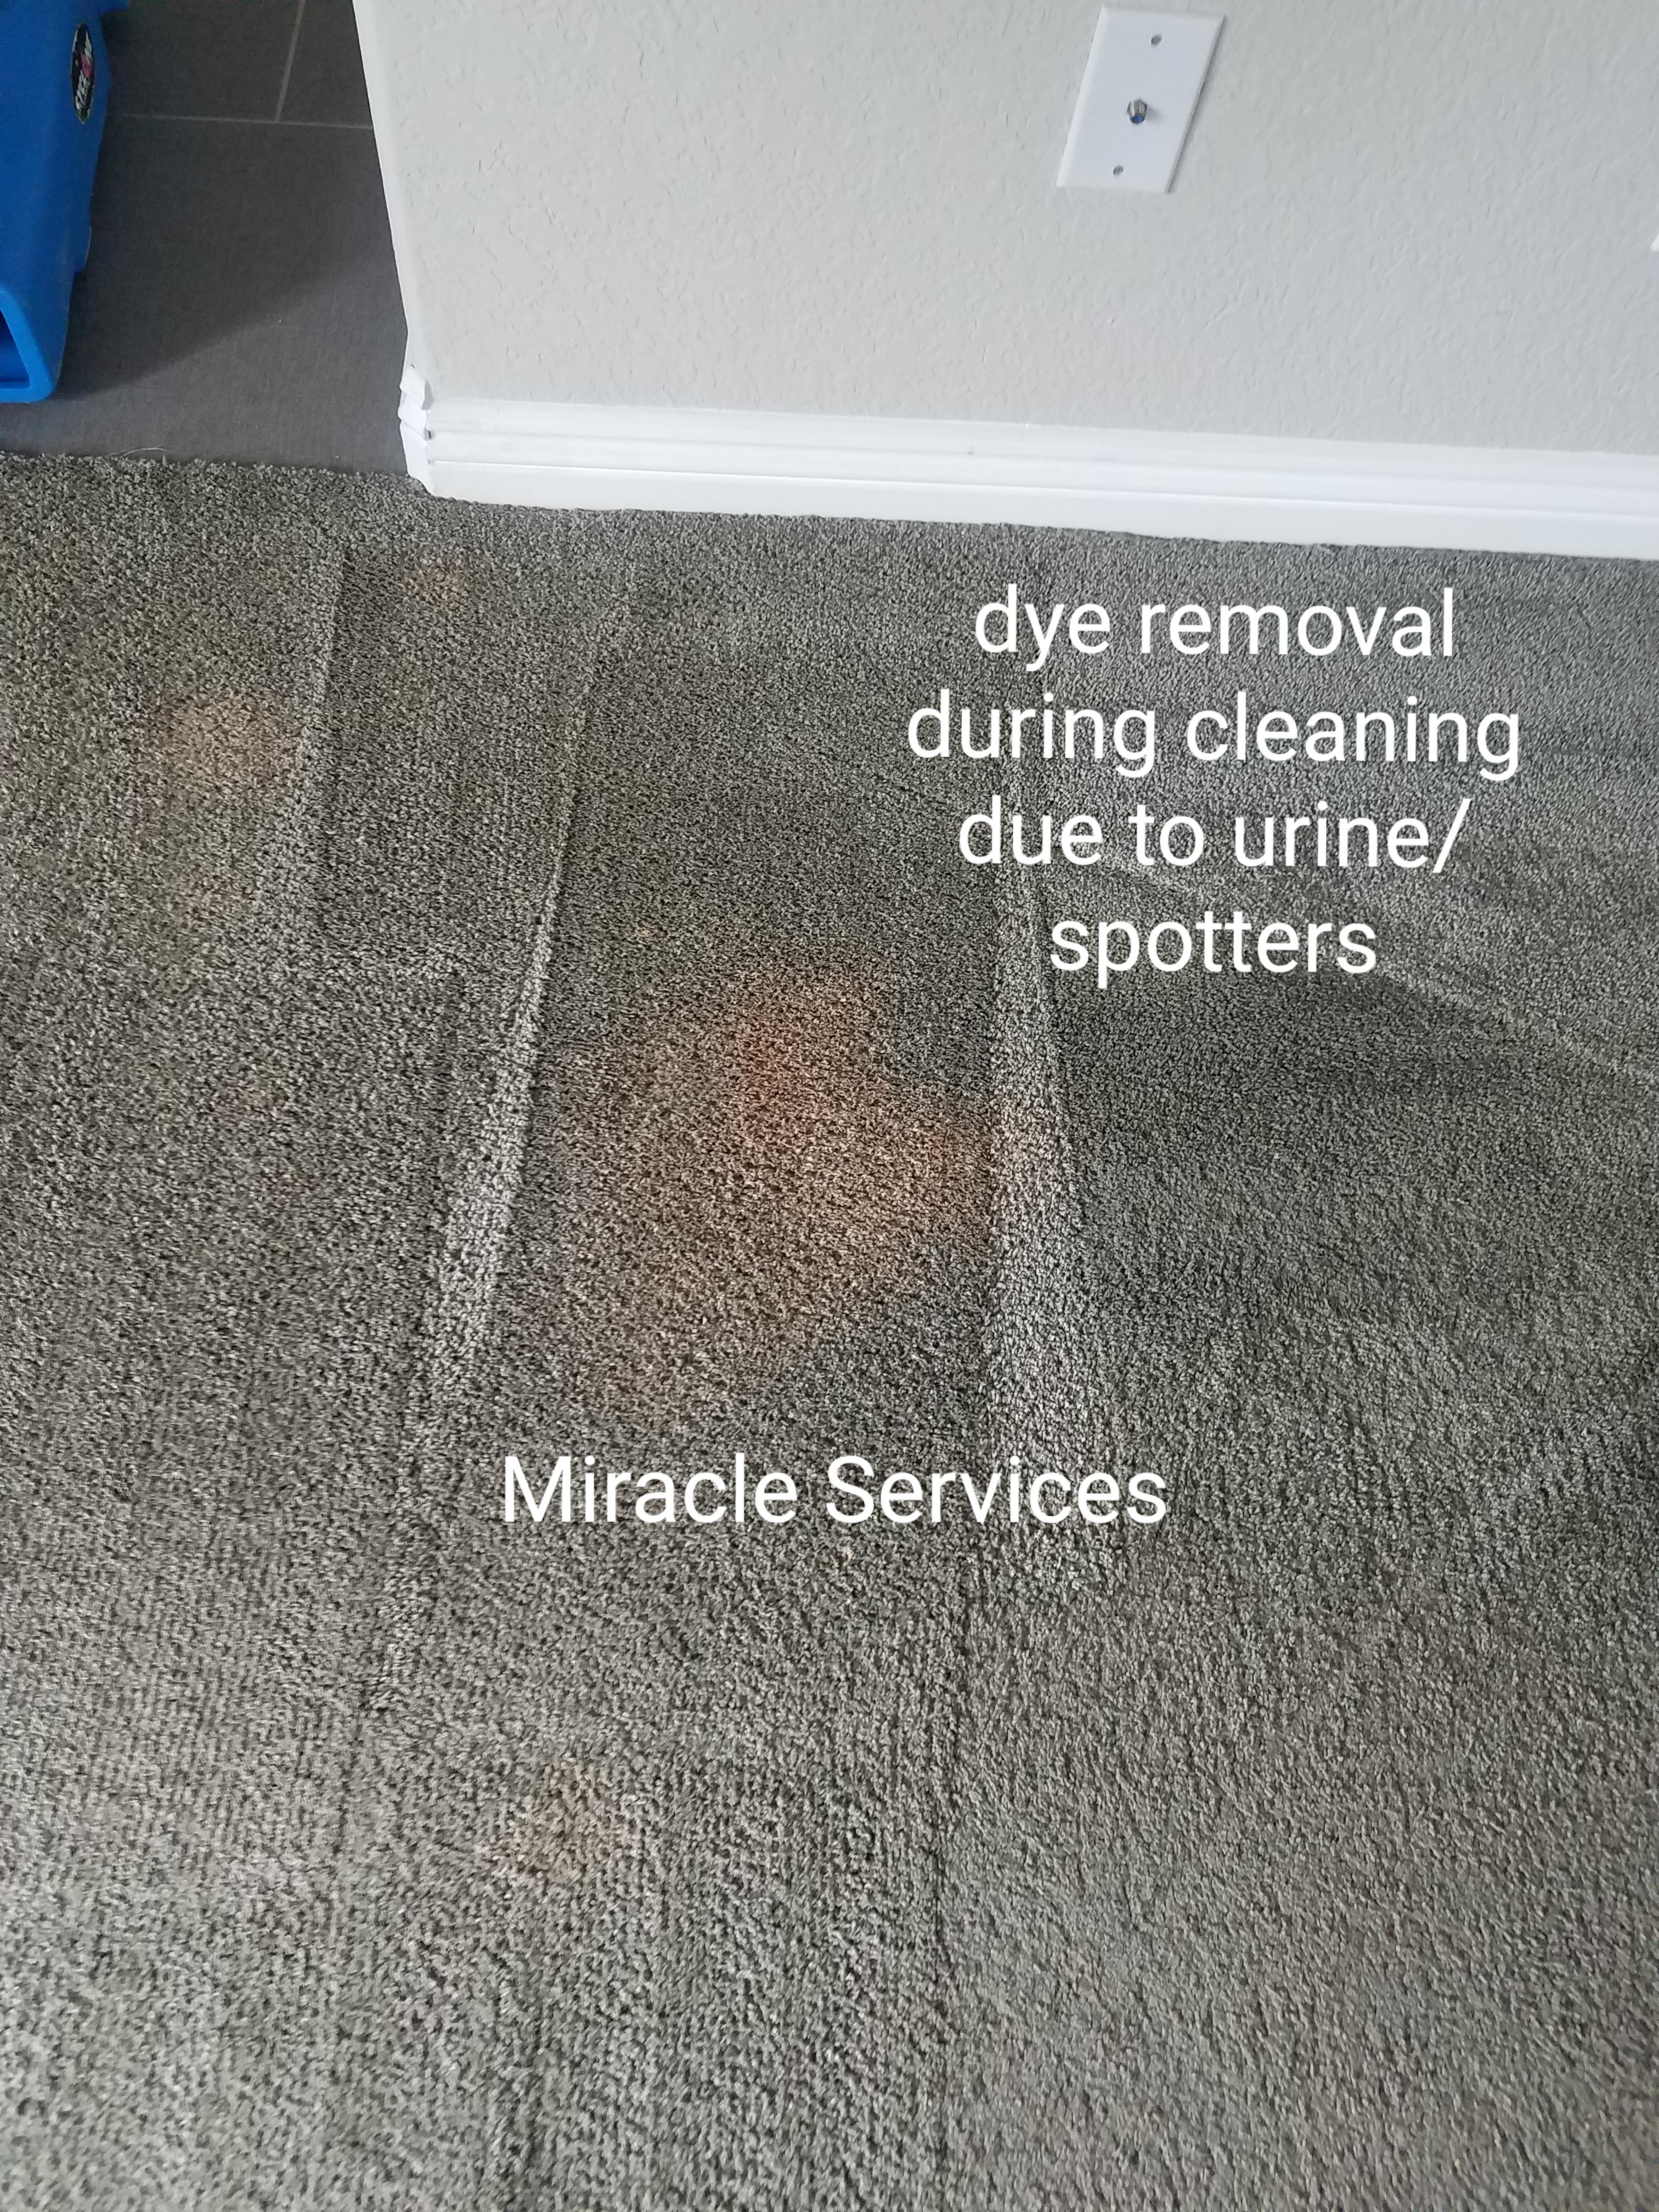 Carpet color loss